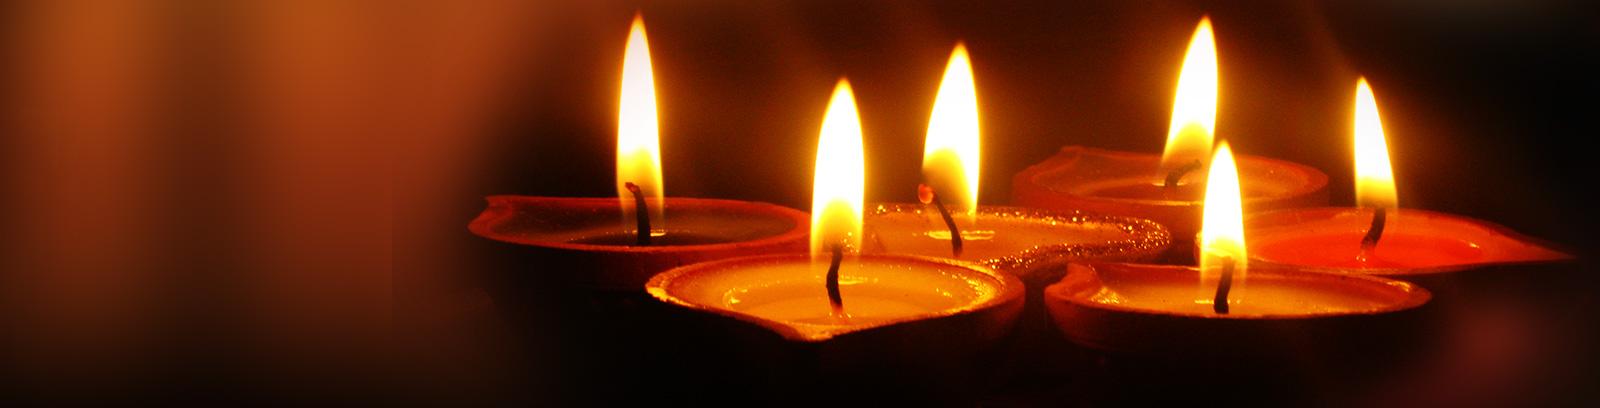 Pooja – Diwali Kerala Holidays | Diwali Holiday Tour Packages